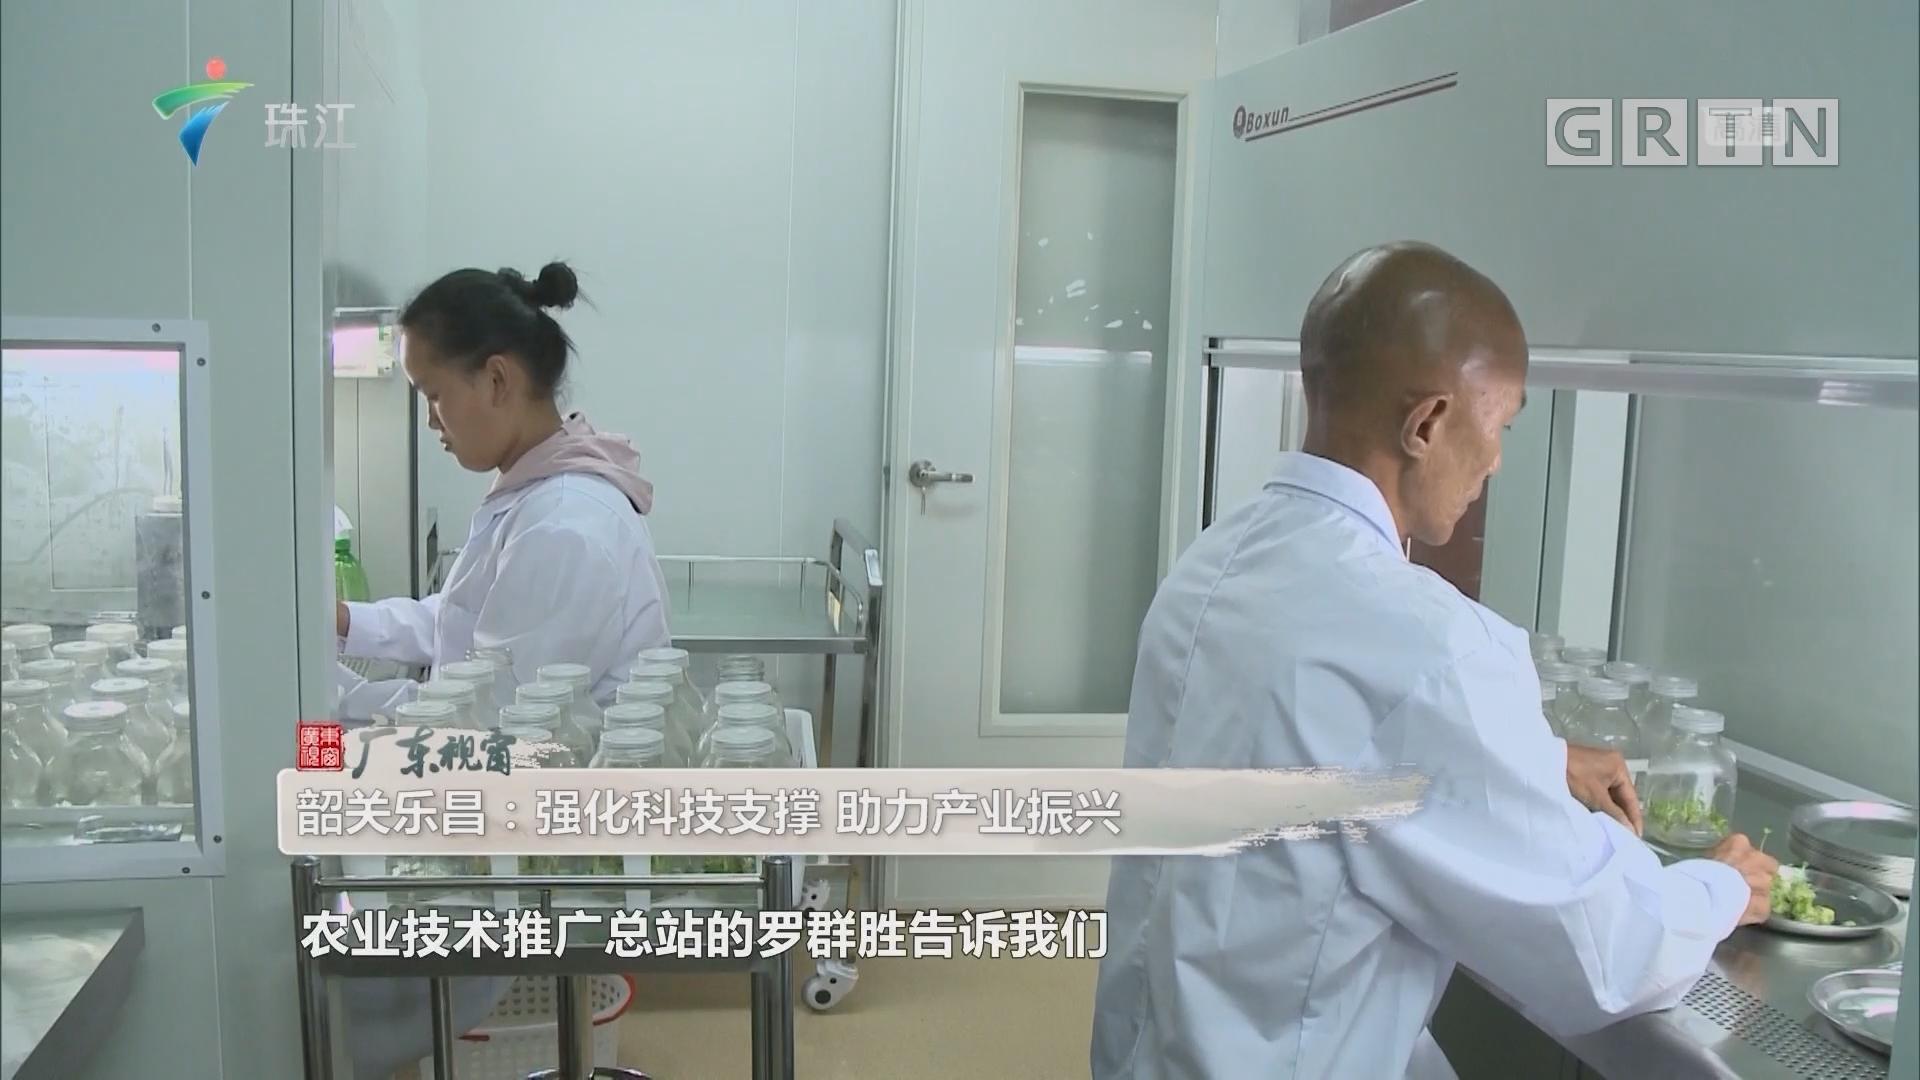 [HD][2019-08-03]广东视窗:韶关乐昌:强化科技支撑 助力产业振兴